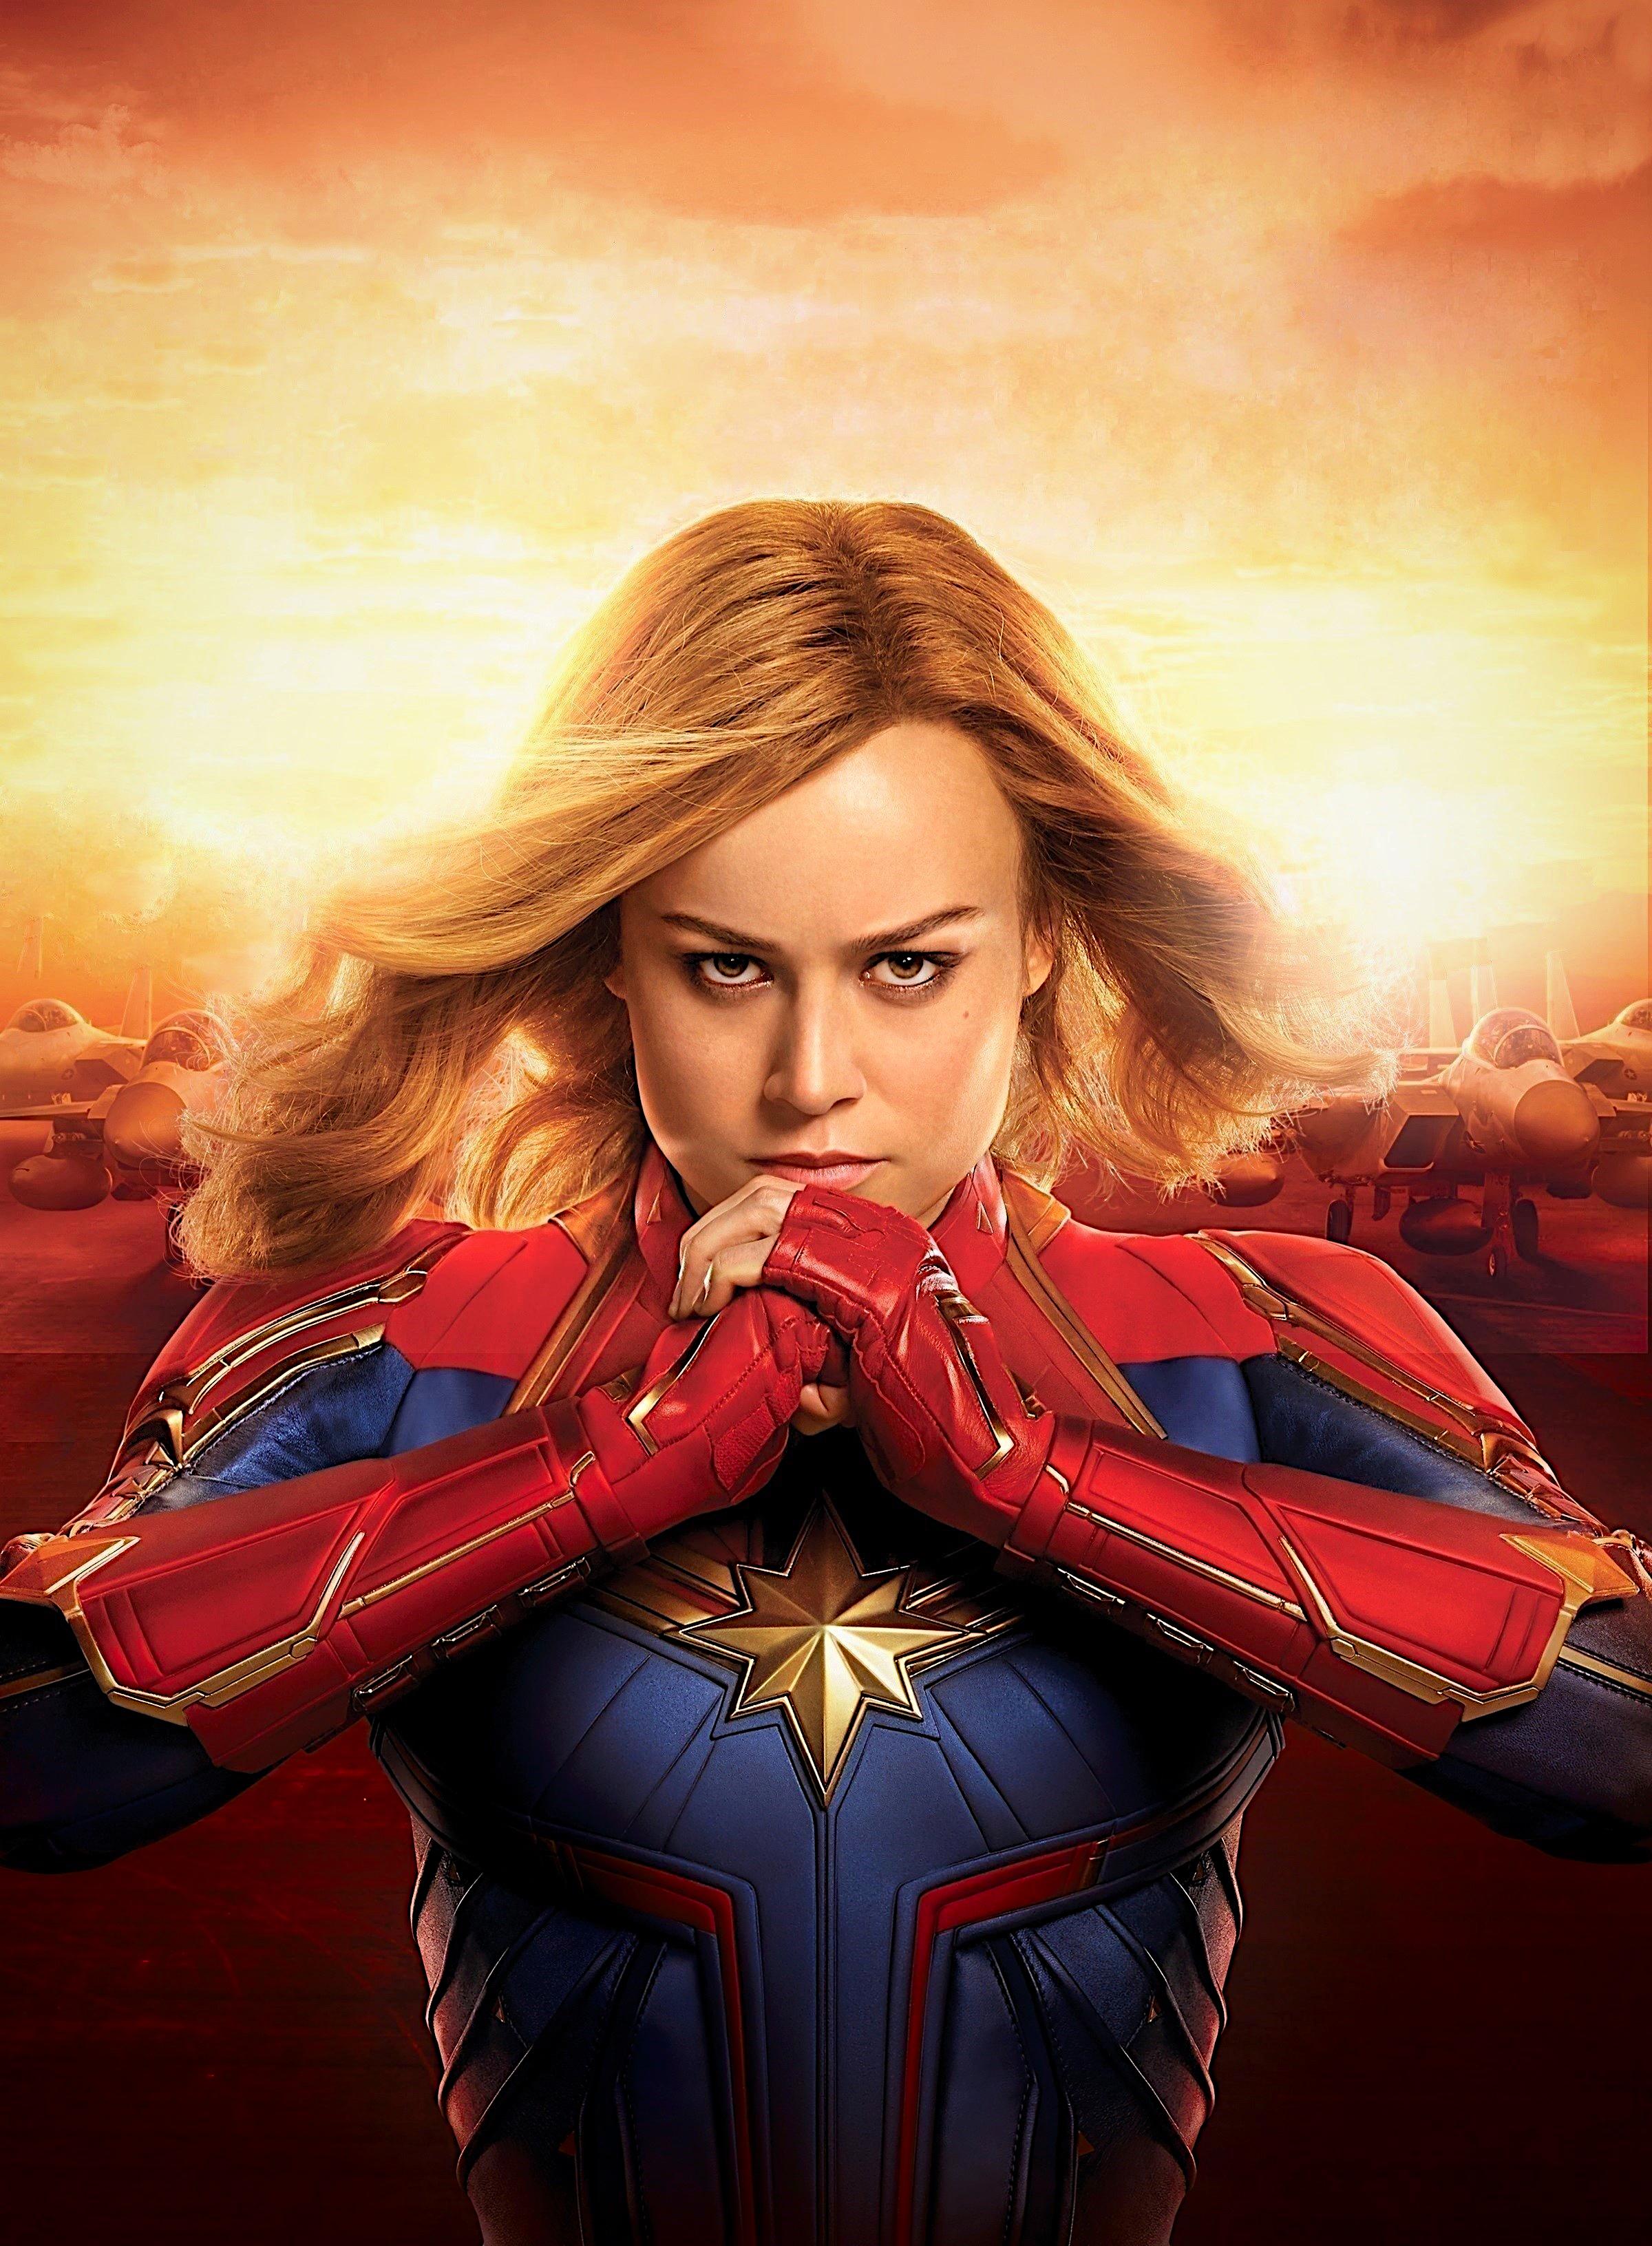 Captain Marvel 2019 Wallpaper, HD Movies 4K Wallpapers ...